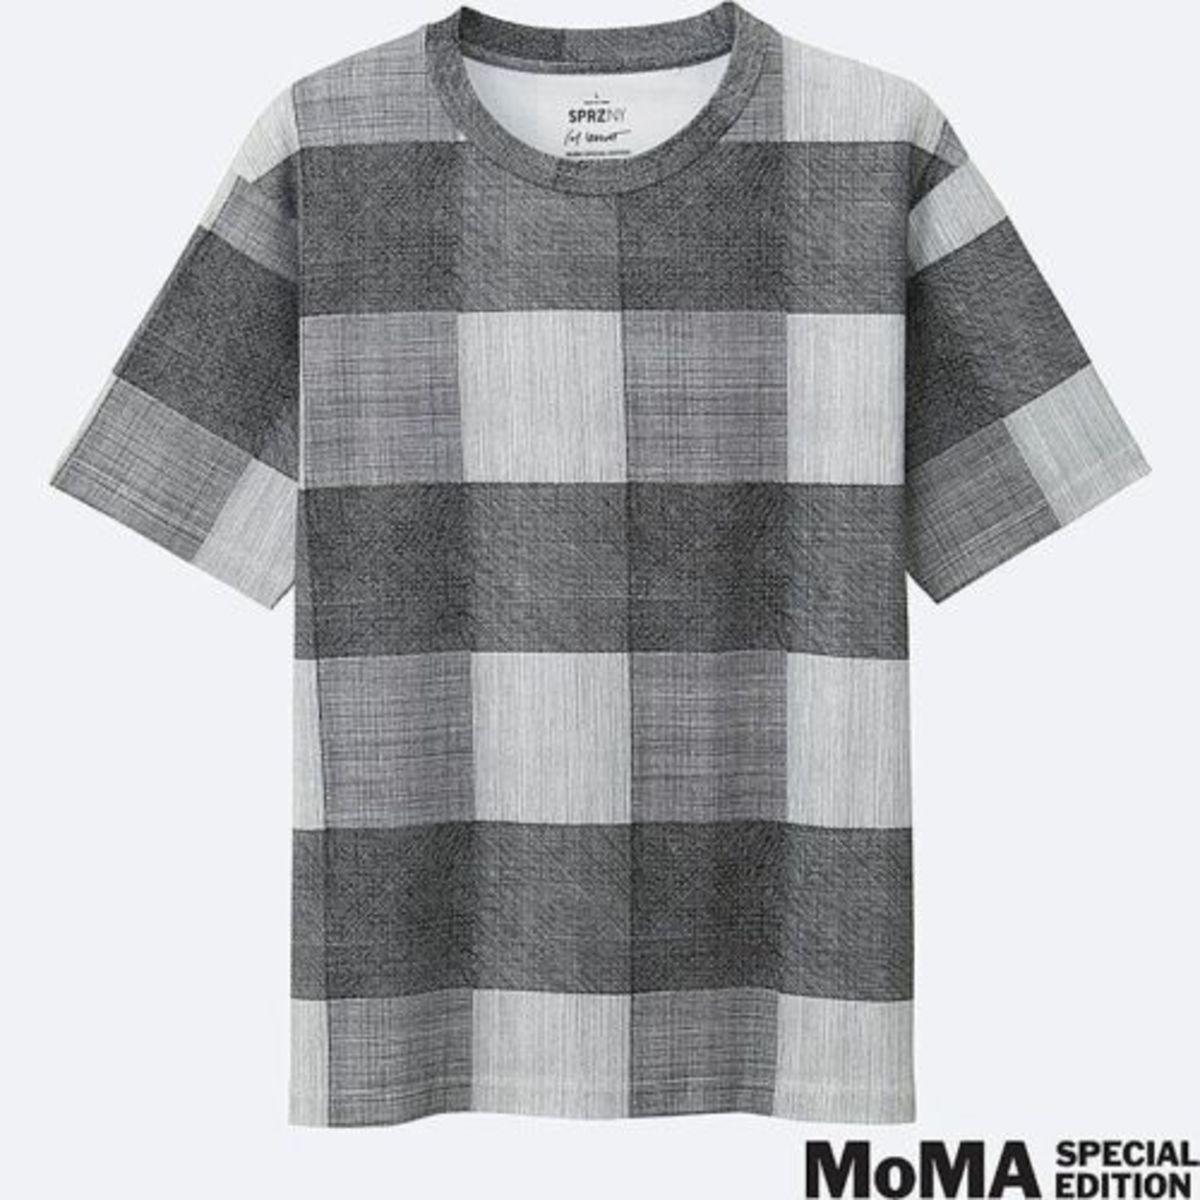 SOL LEWITT x UNIQLO 'Lines   Grids' SPRZ NY MoMA Art T-Shirt Geometric SMALL NWT